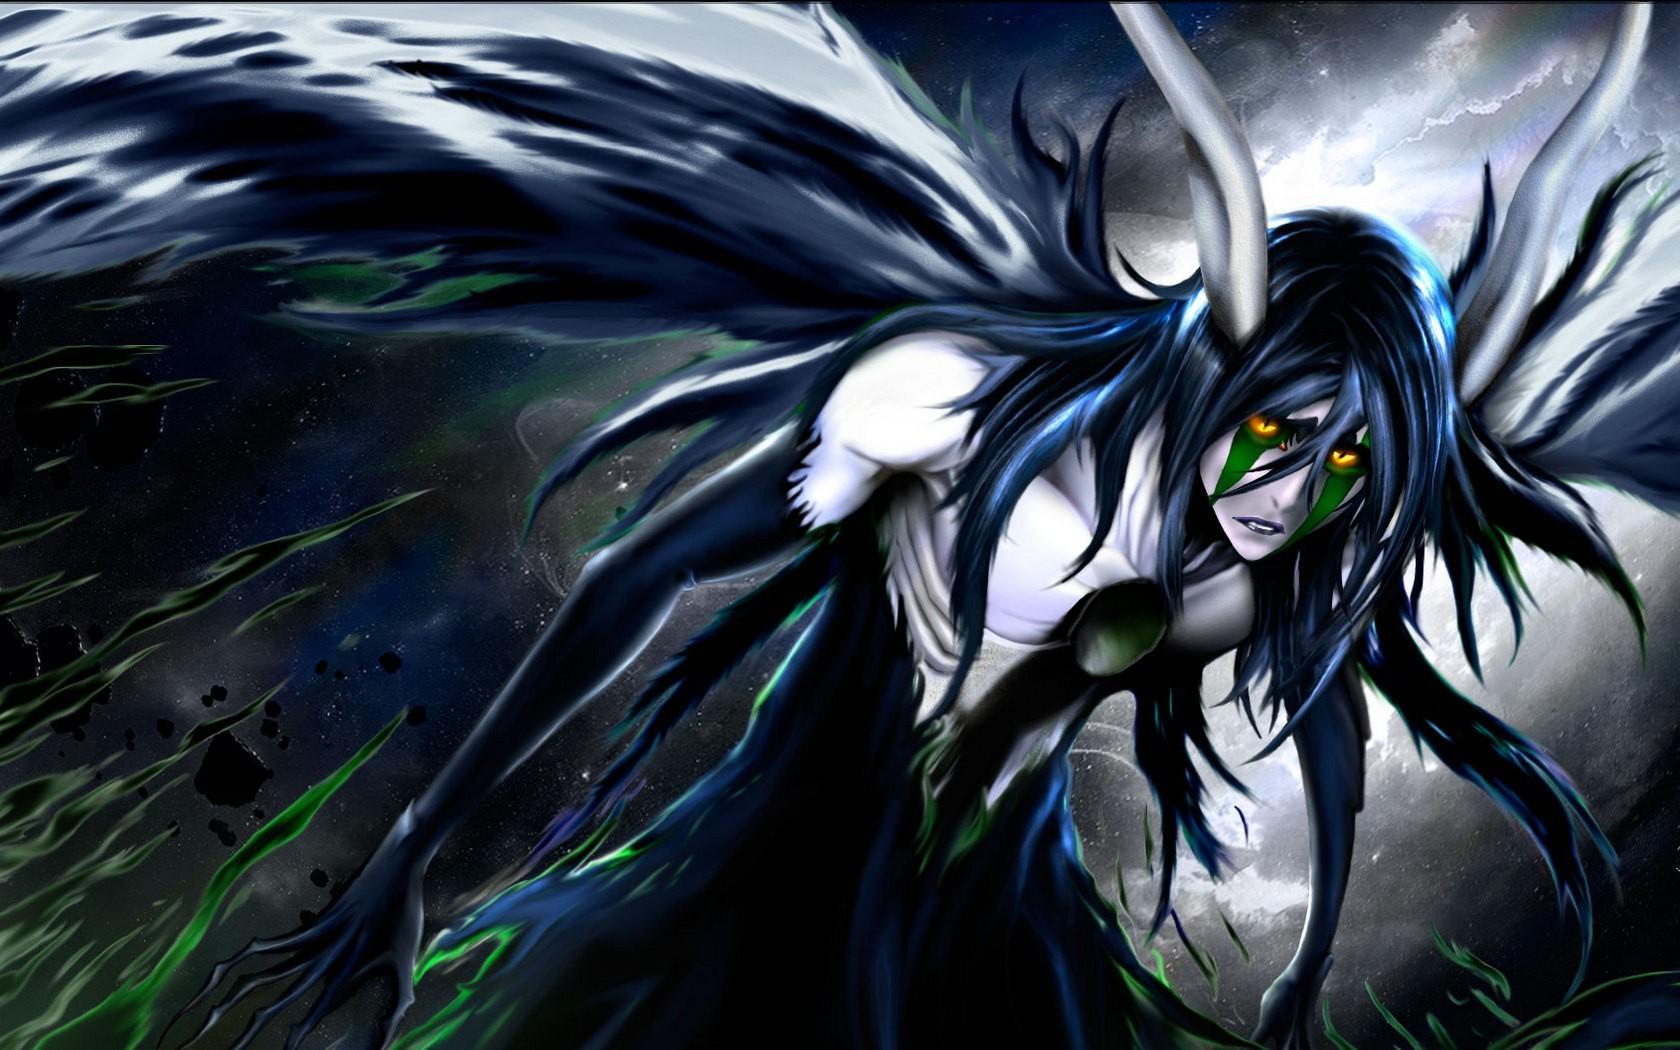 Wallpaper : anime, Bleach, Ulquiorra Cifer, Espada, wing ...